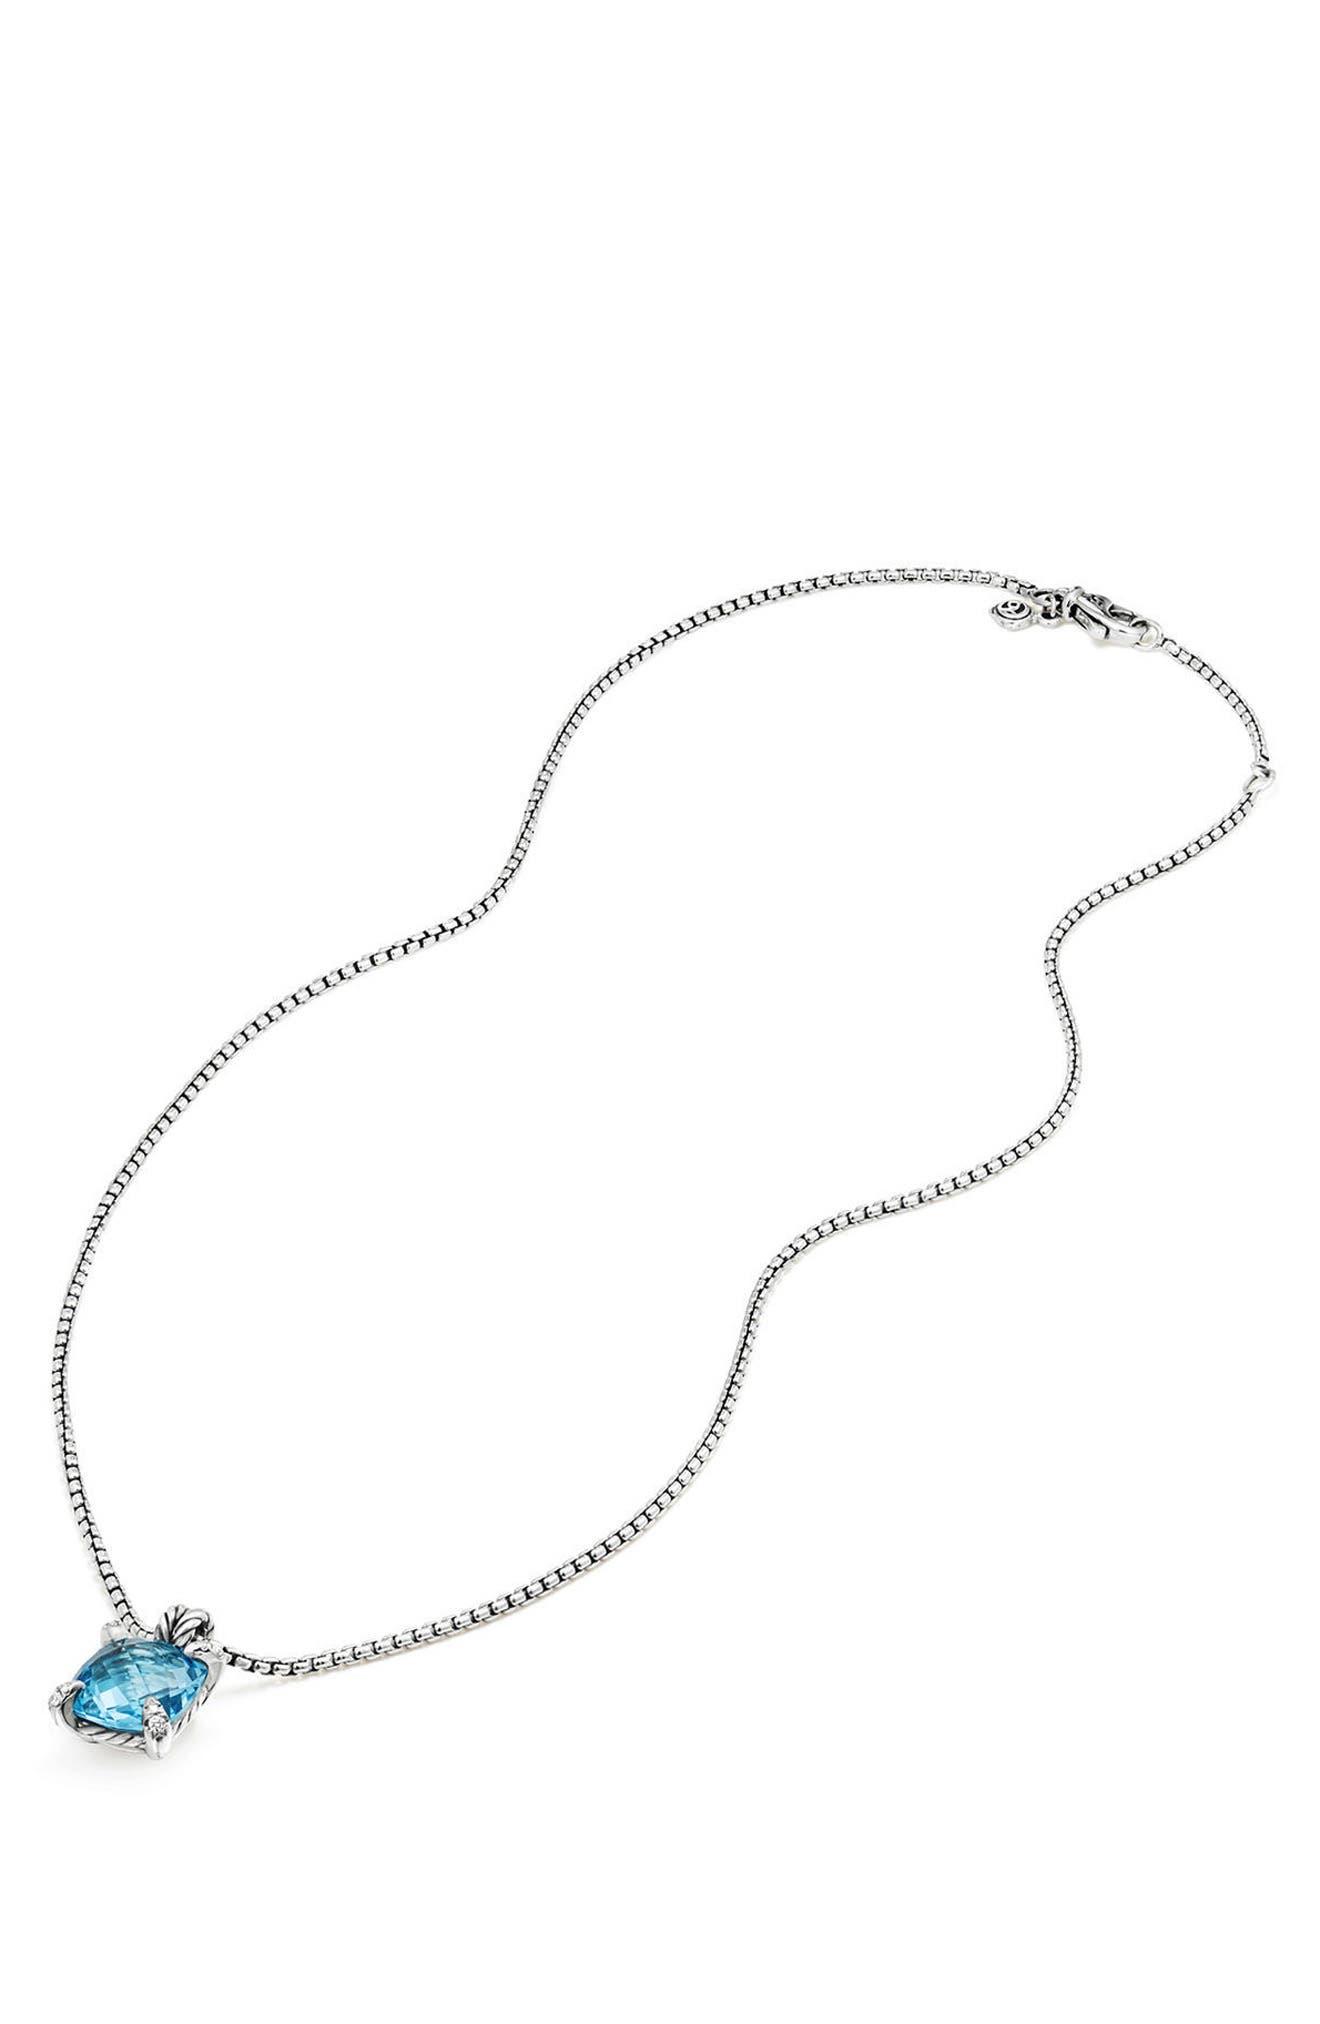 Alternate Image 1 Selected - David Yurman Châtelaine Pendant Necklace with Semiprecious Stone & Diamonds